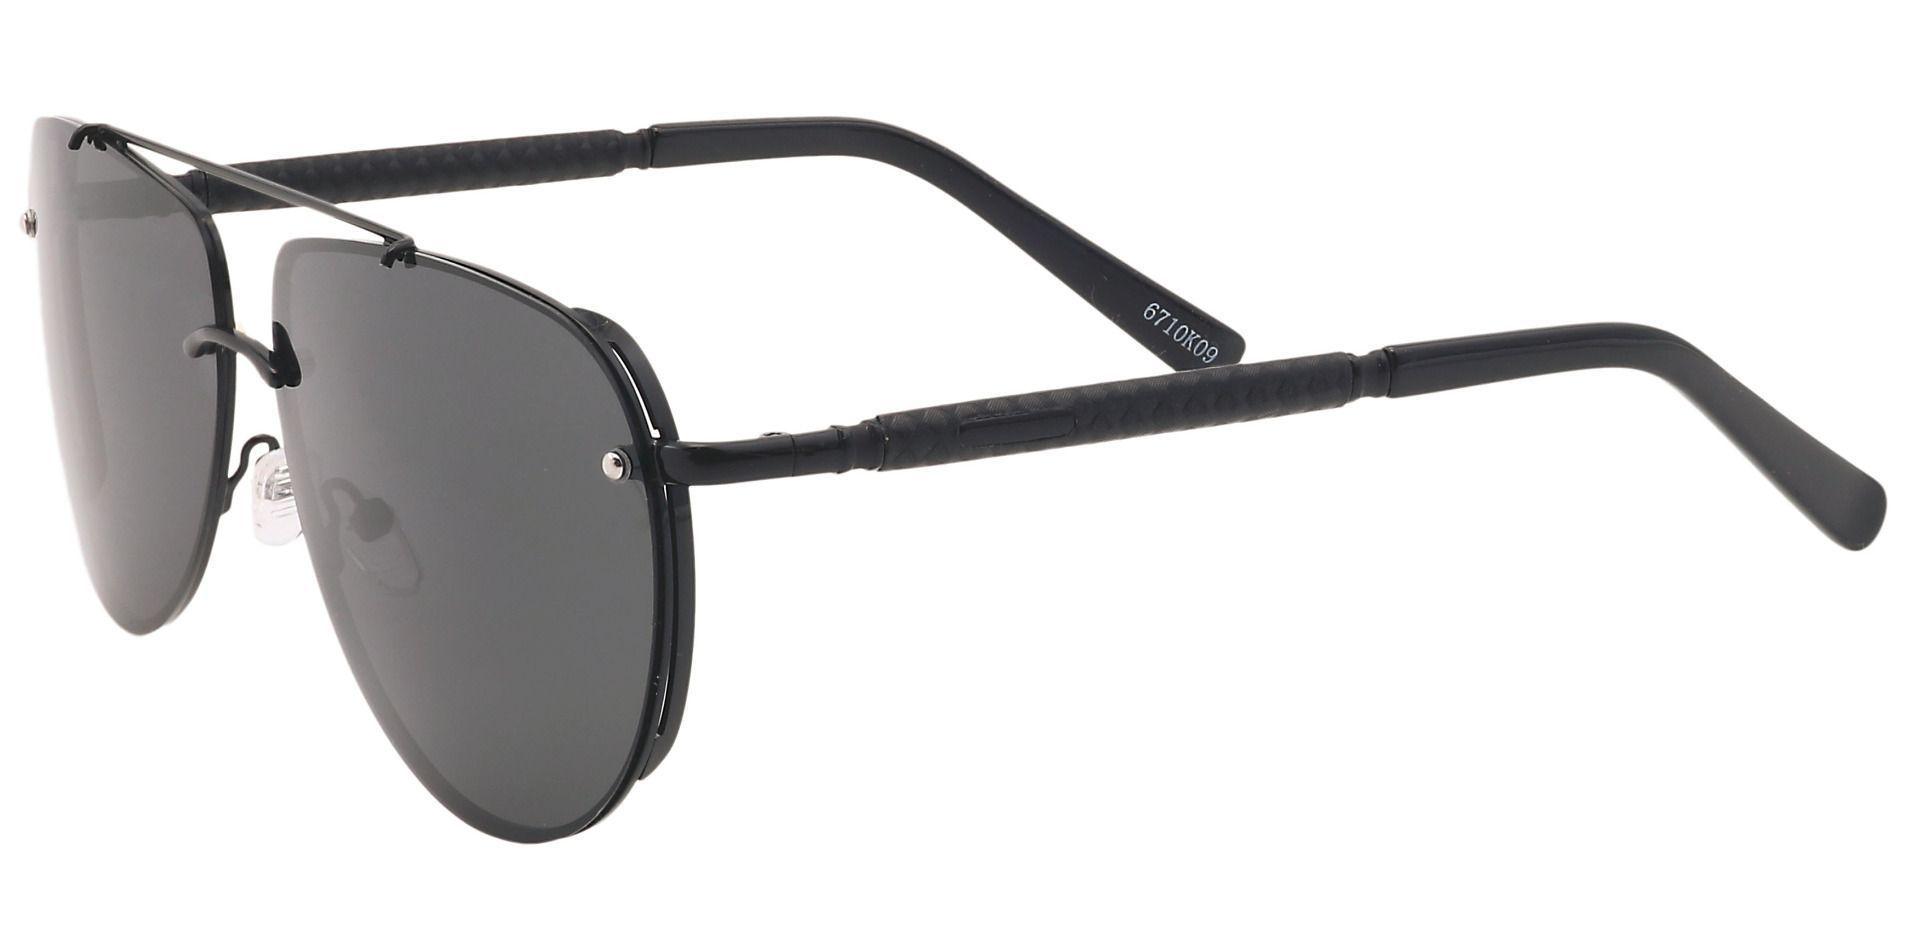 Artie Aviator Non-Rx Sunglasses - Black Frame With Gray Lenses